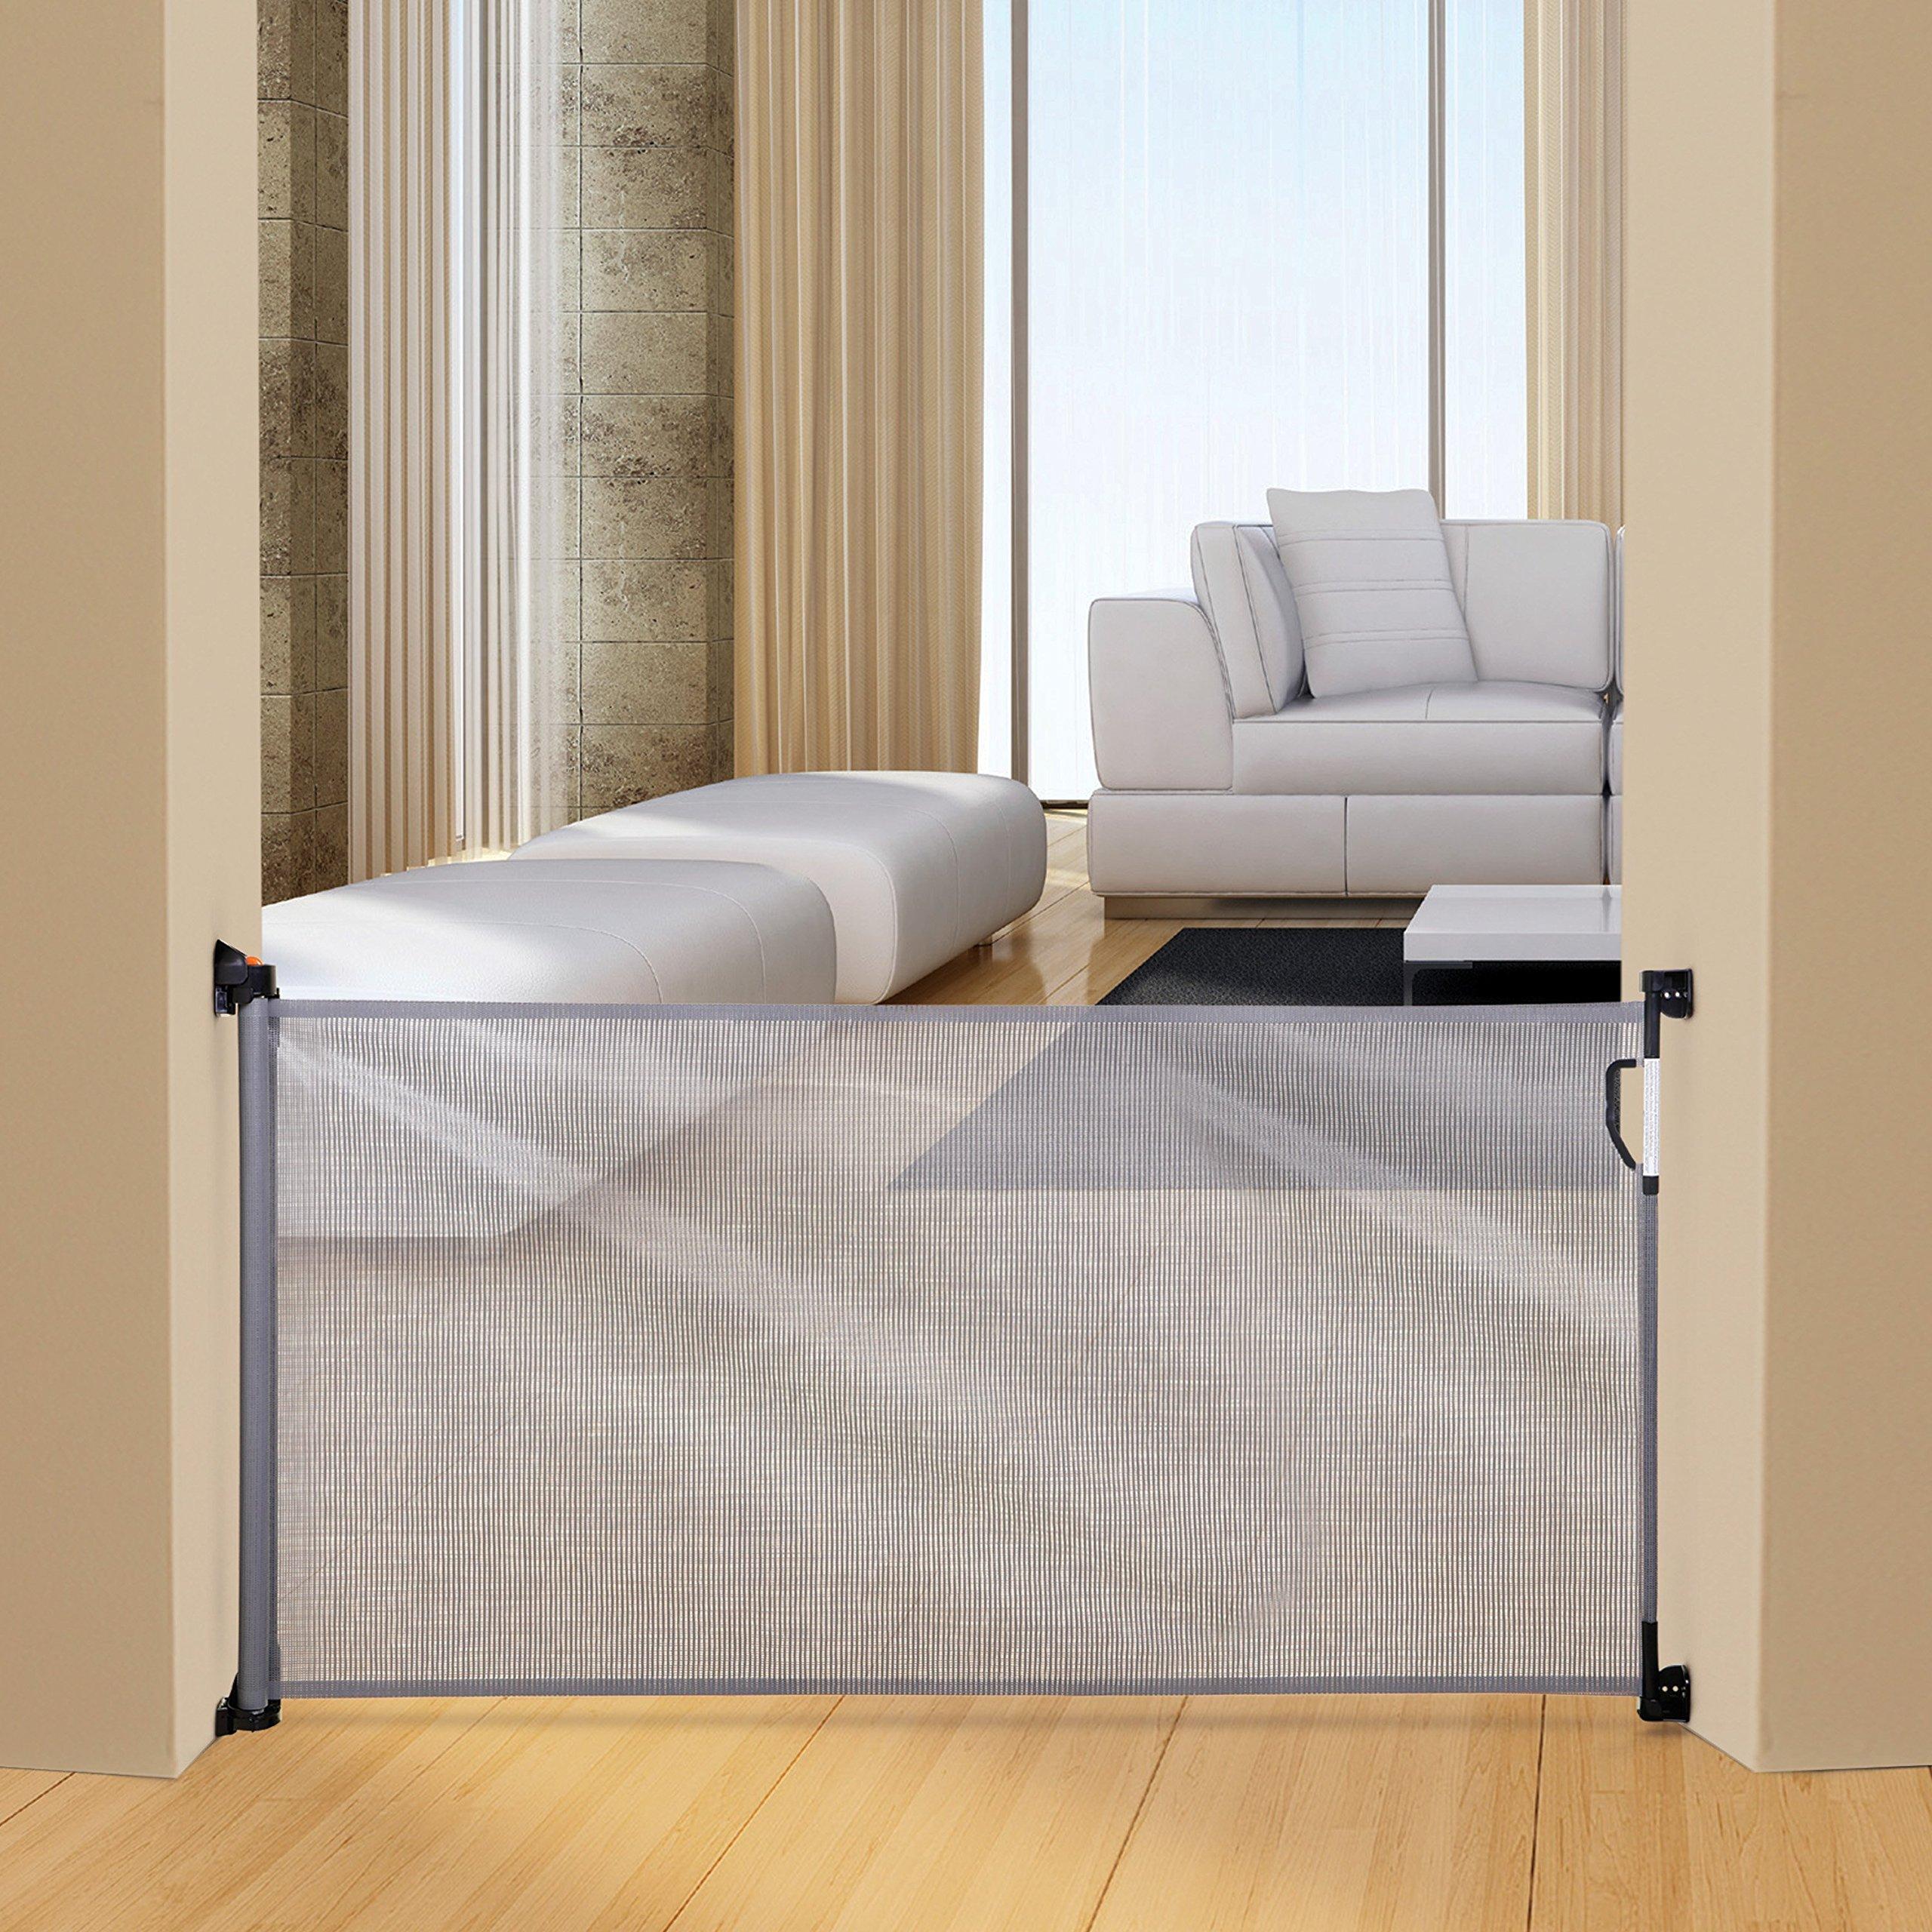 Dreambaby Retractable Gate, Grey by Dreambaby (Image #2)